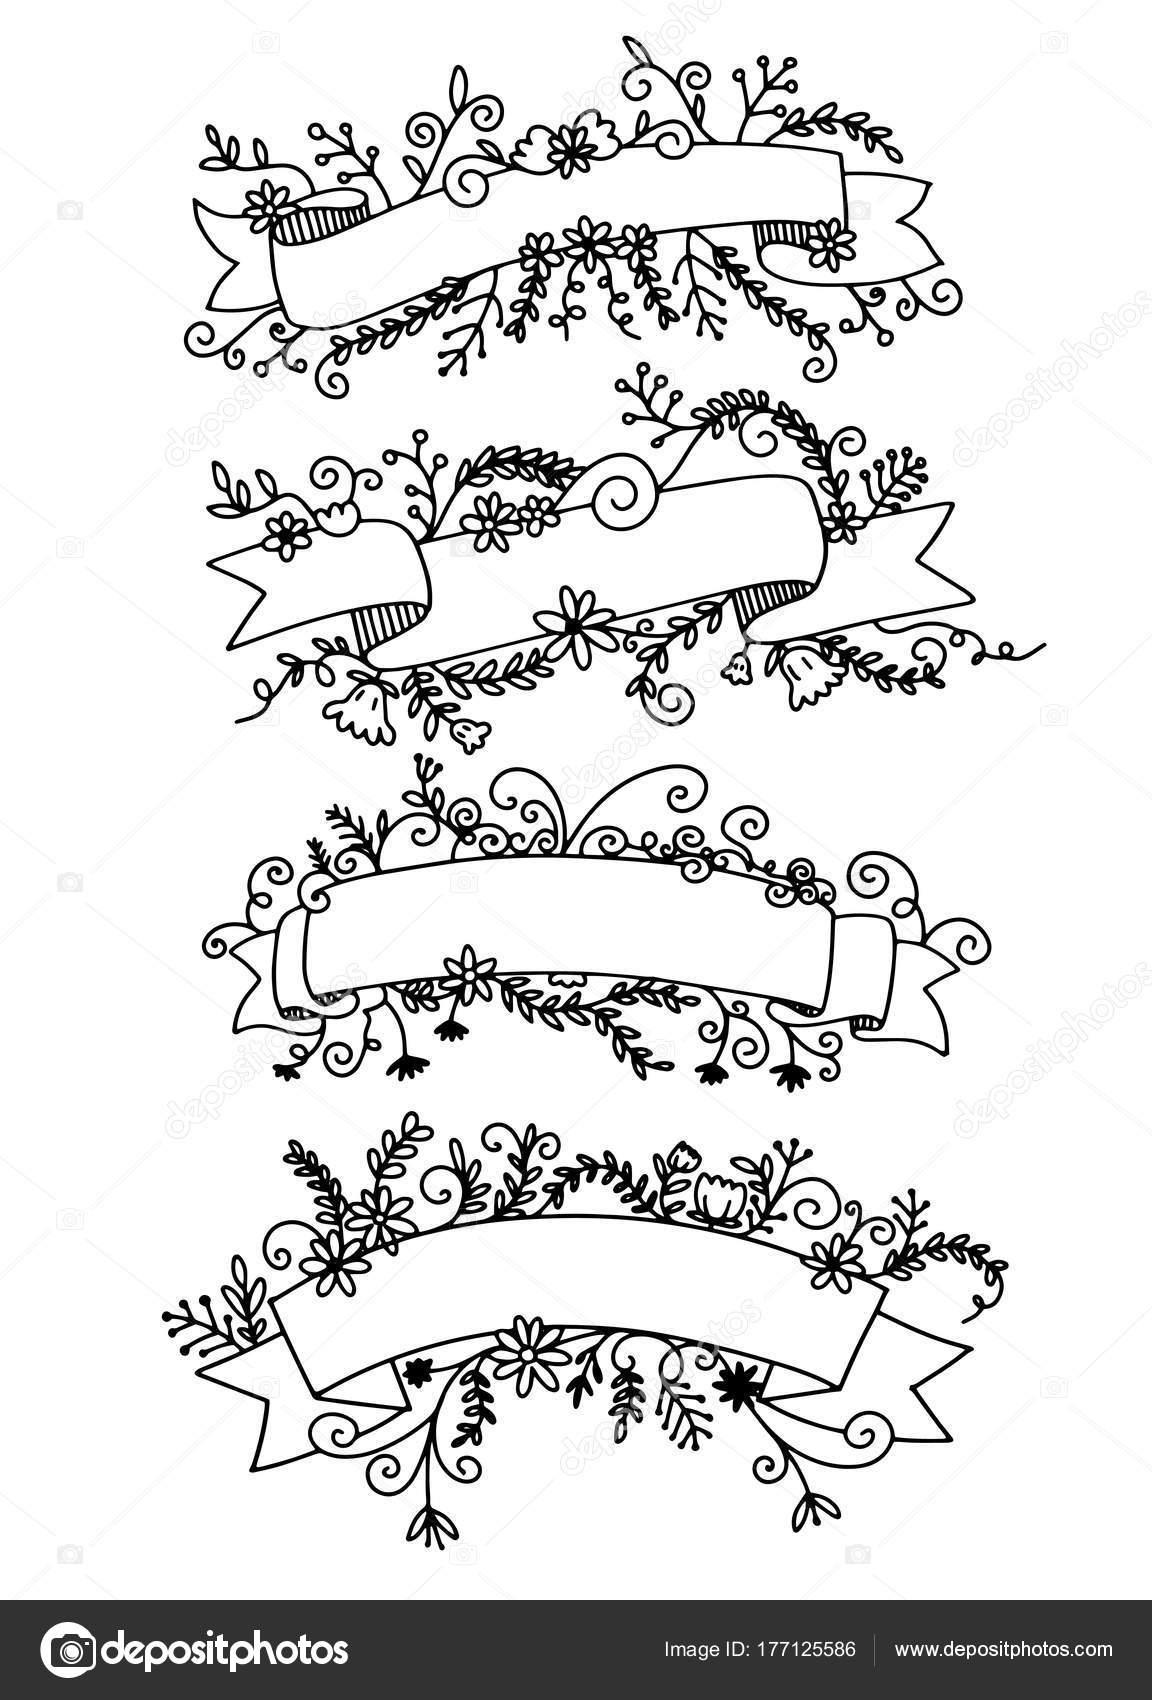 Vintage ornate frames, decorative ornaments, flourish and scroll ...